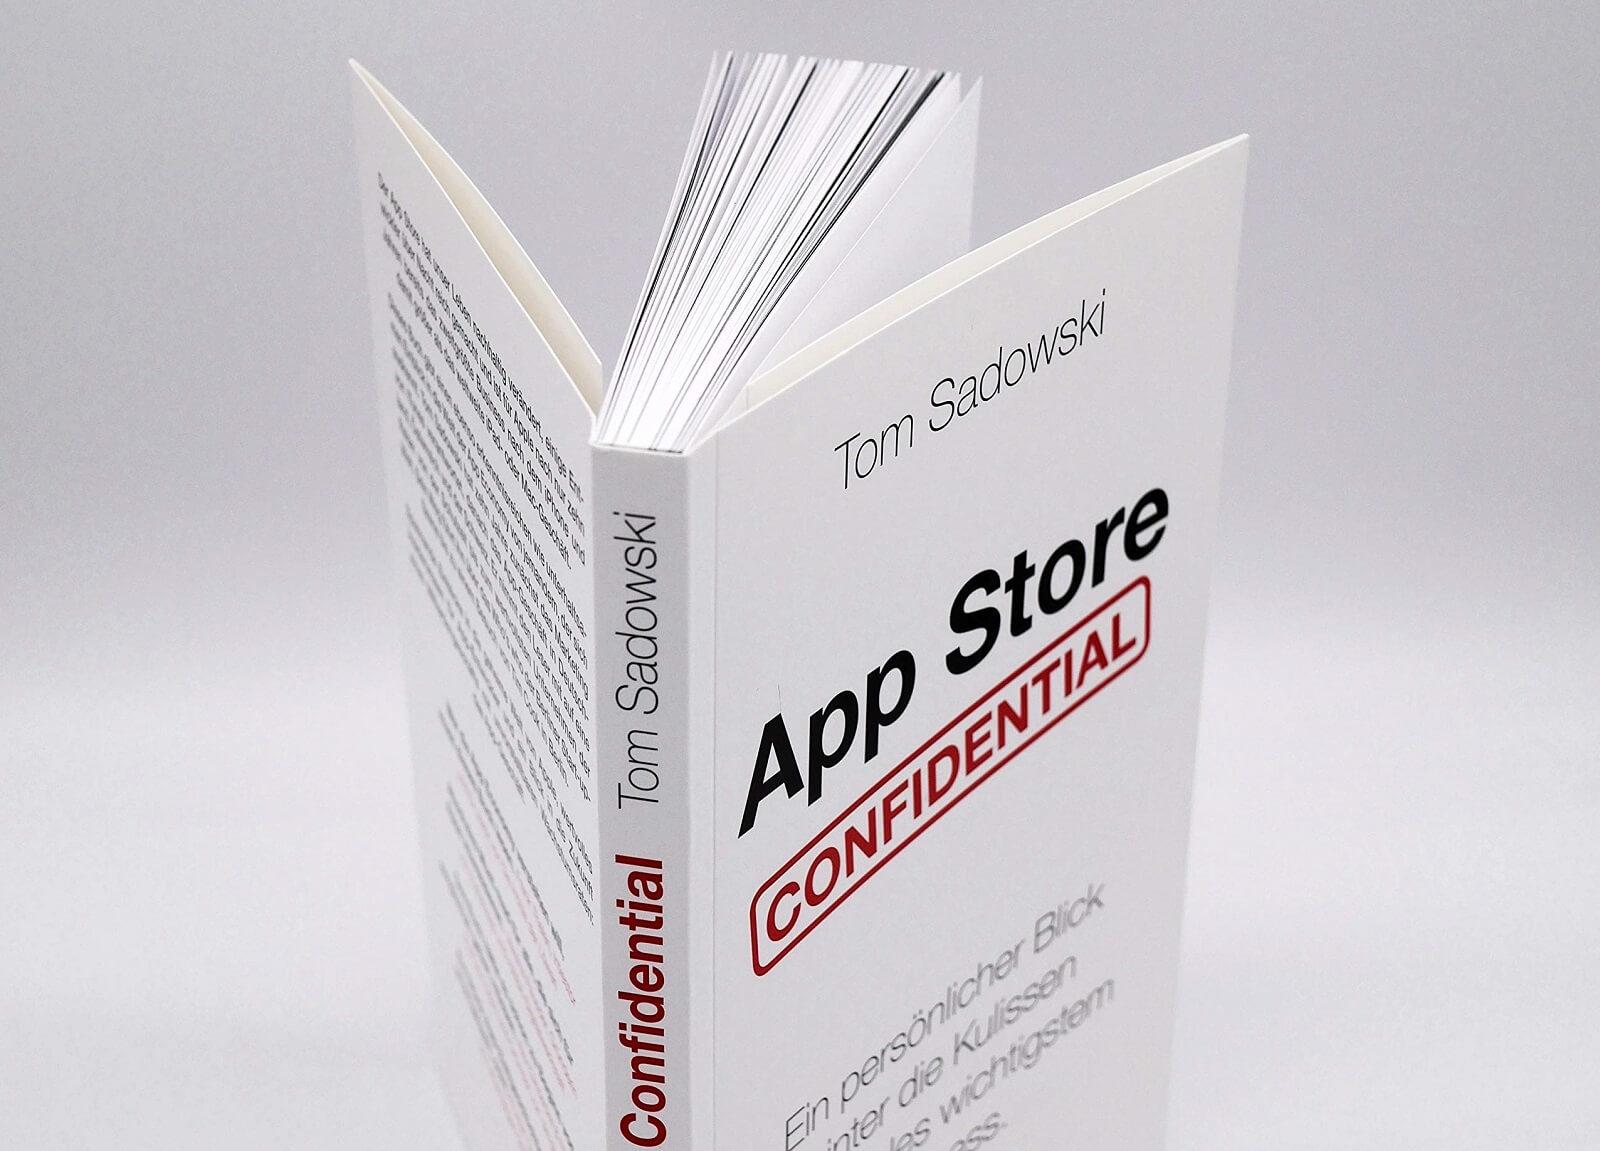 app store confidental tit 1